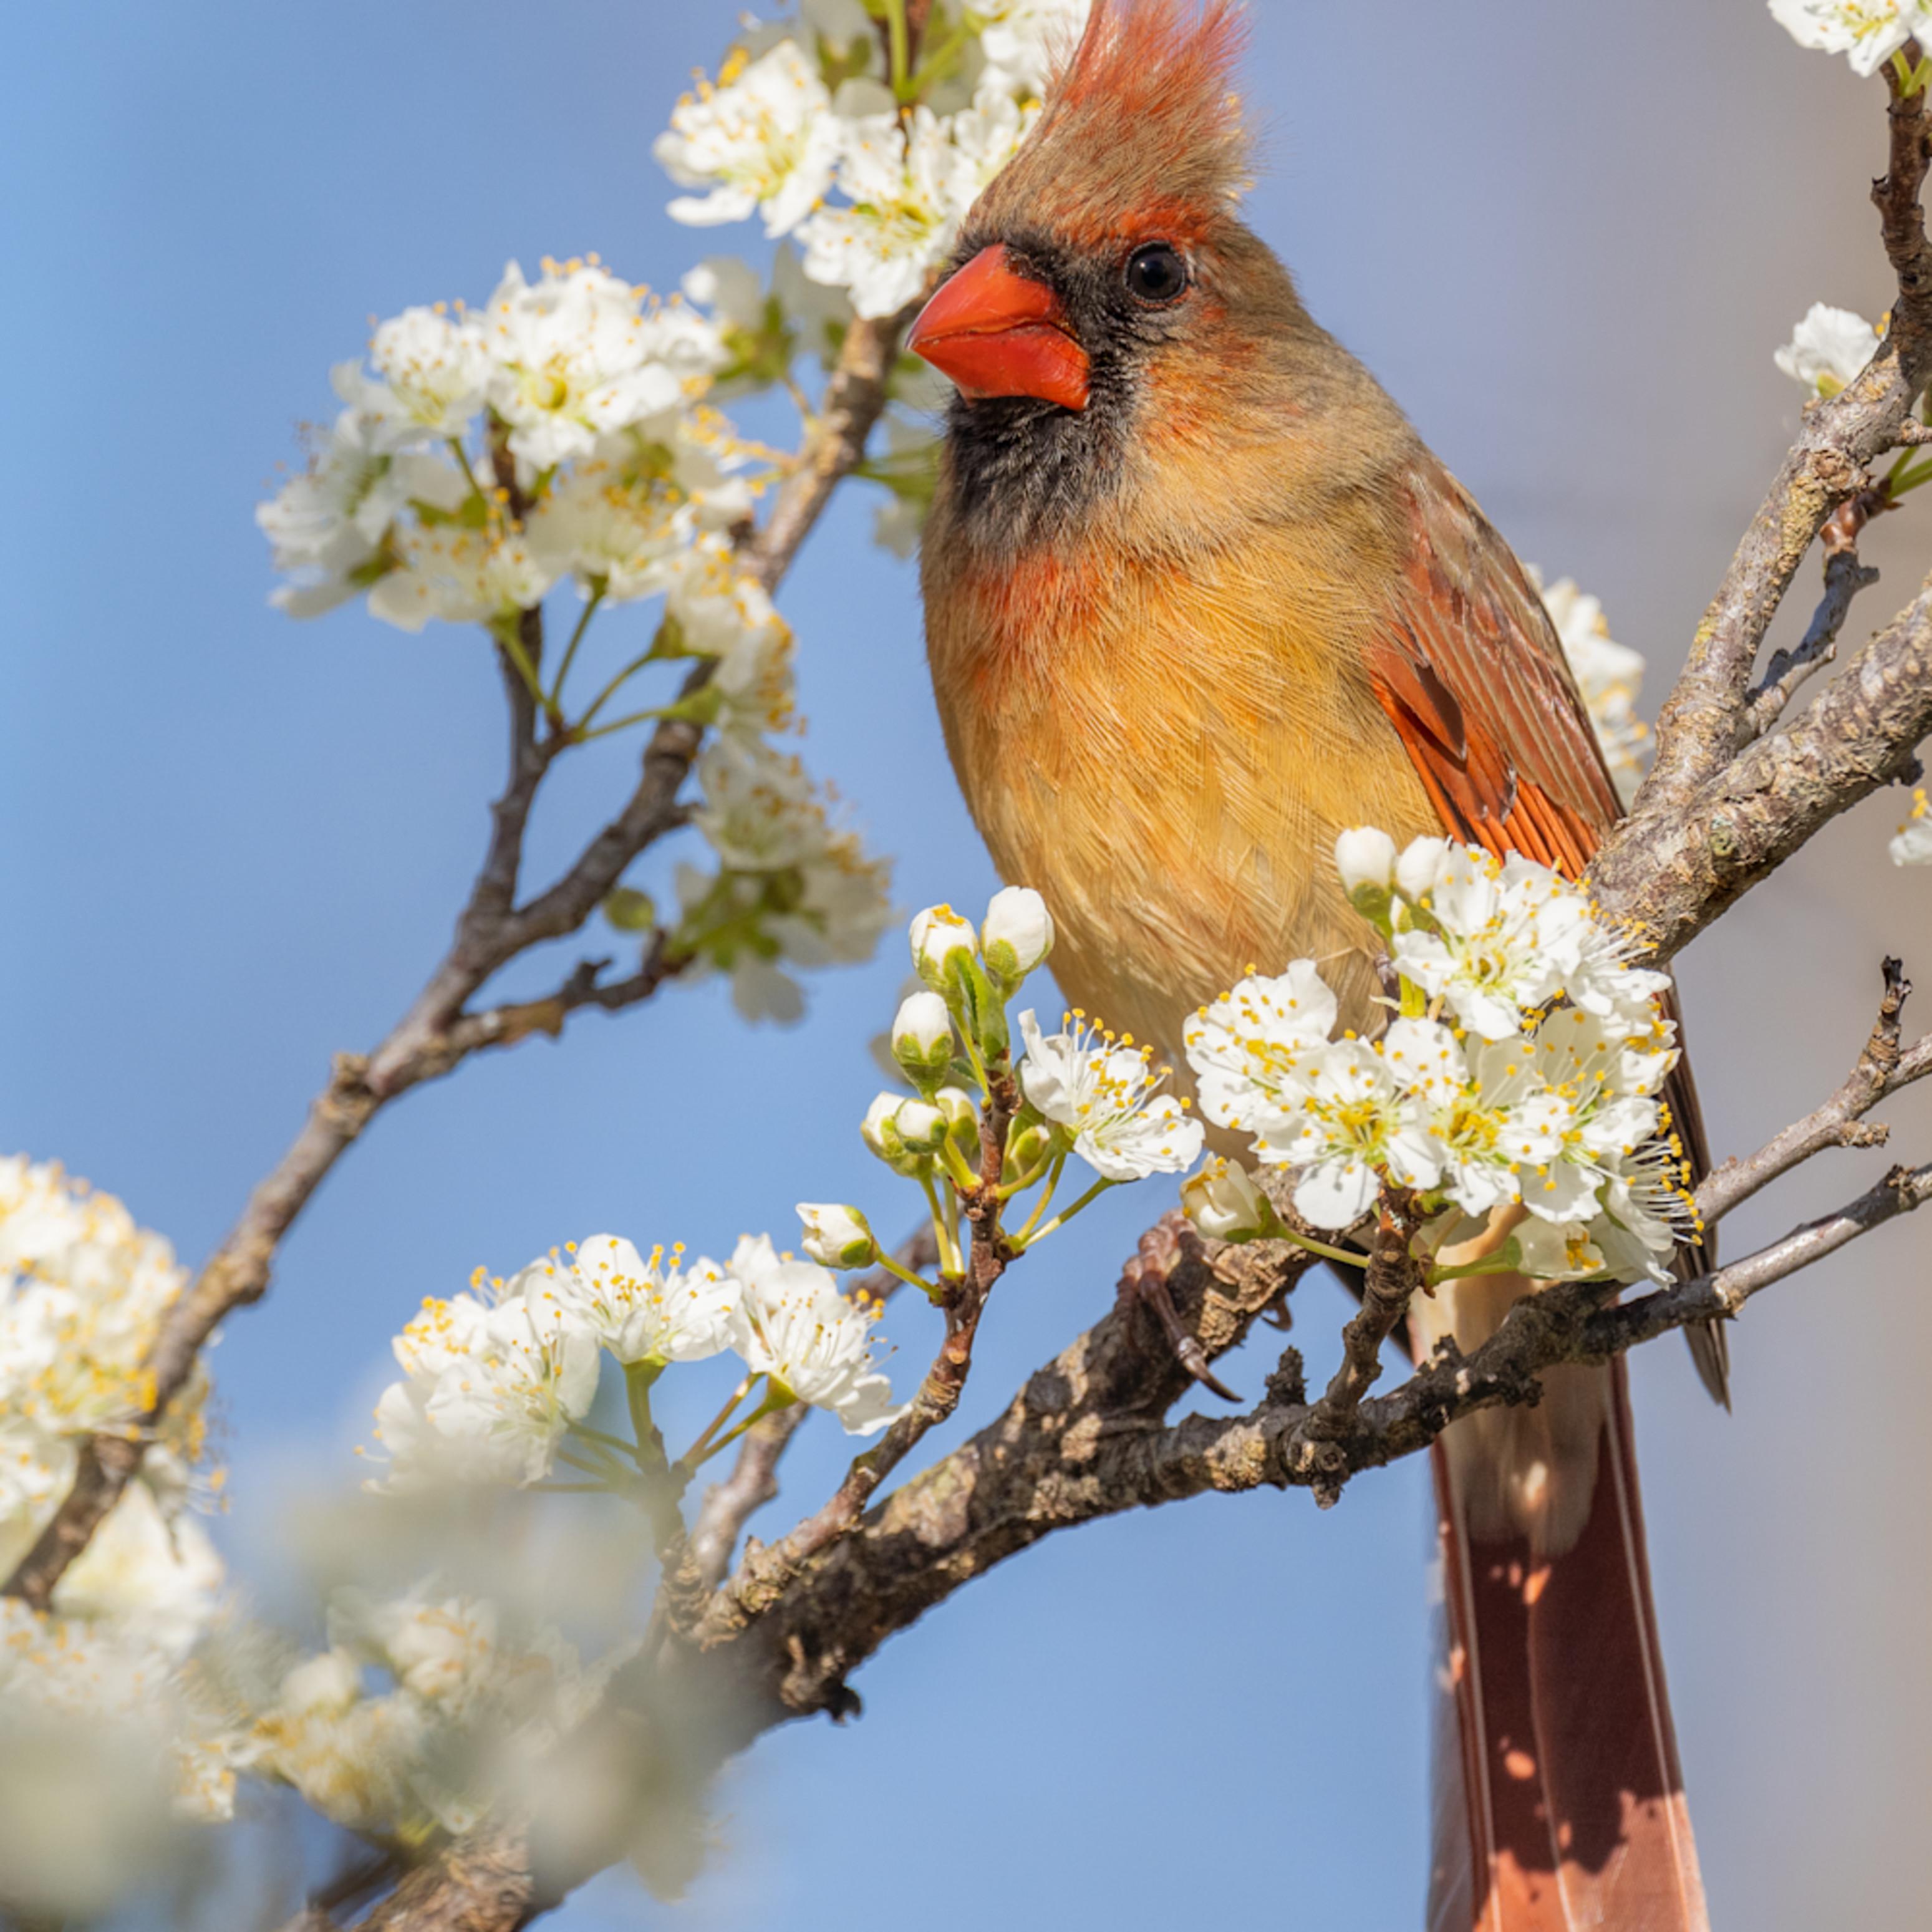 Northern cardinal femalet kvlhoe